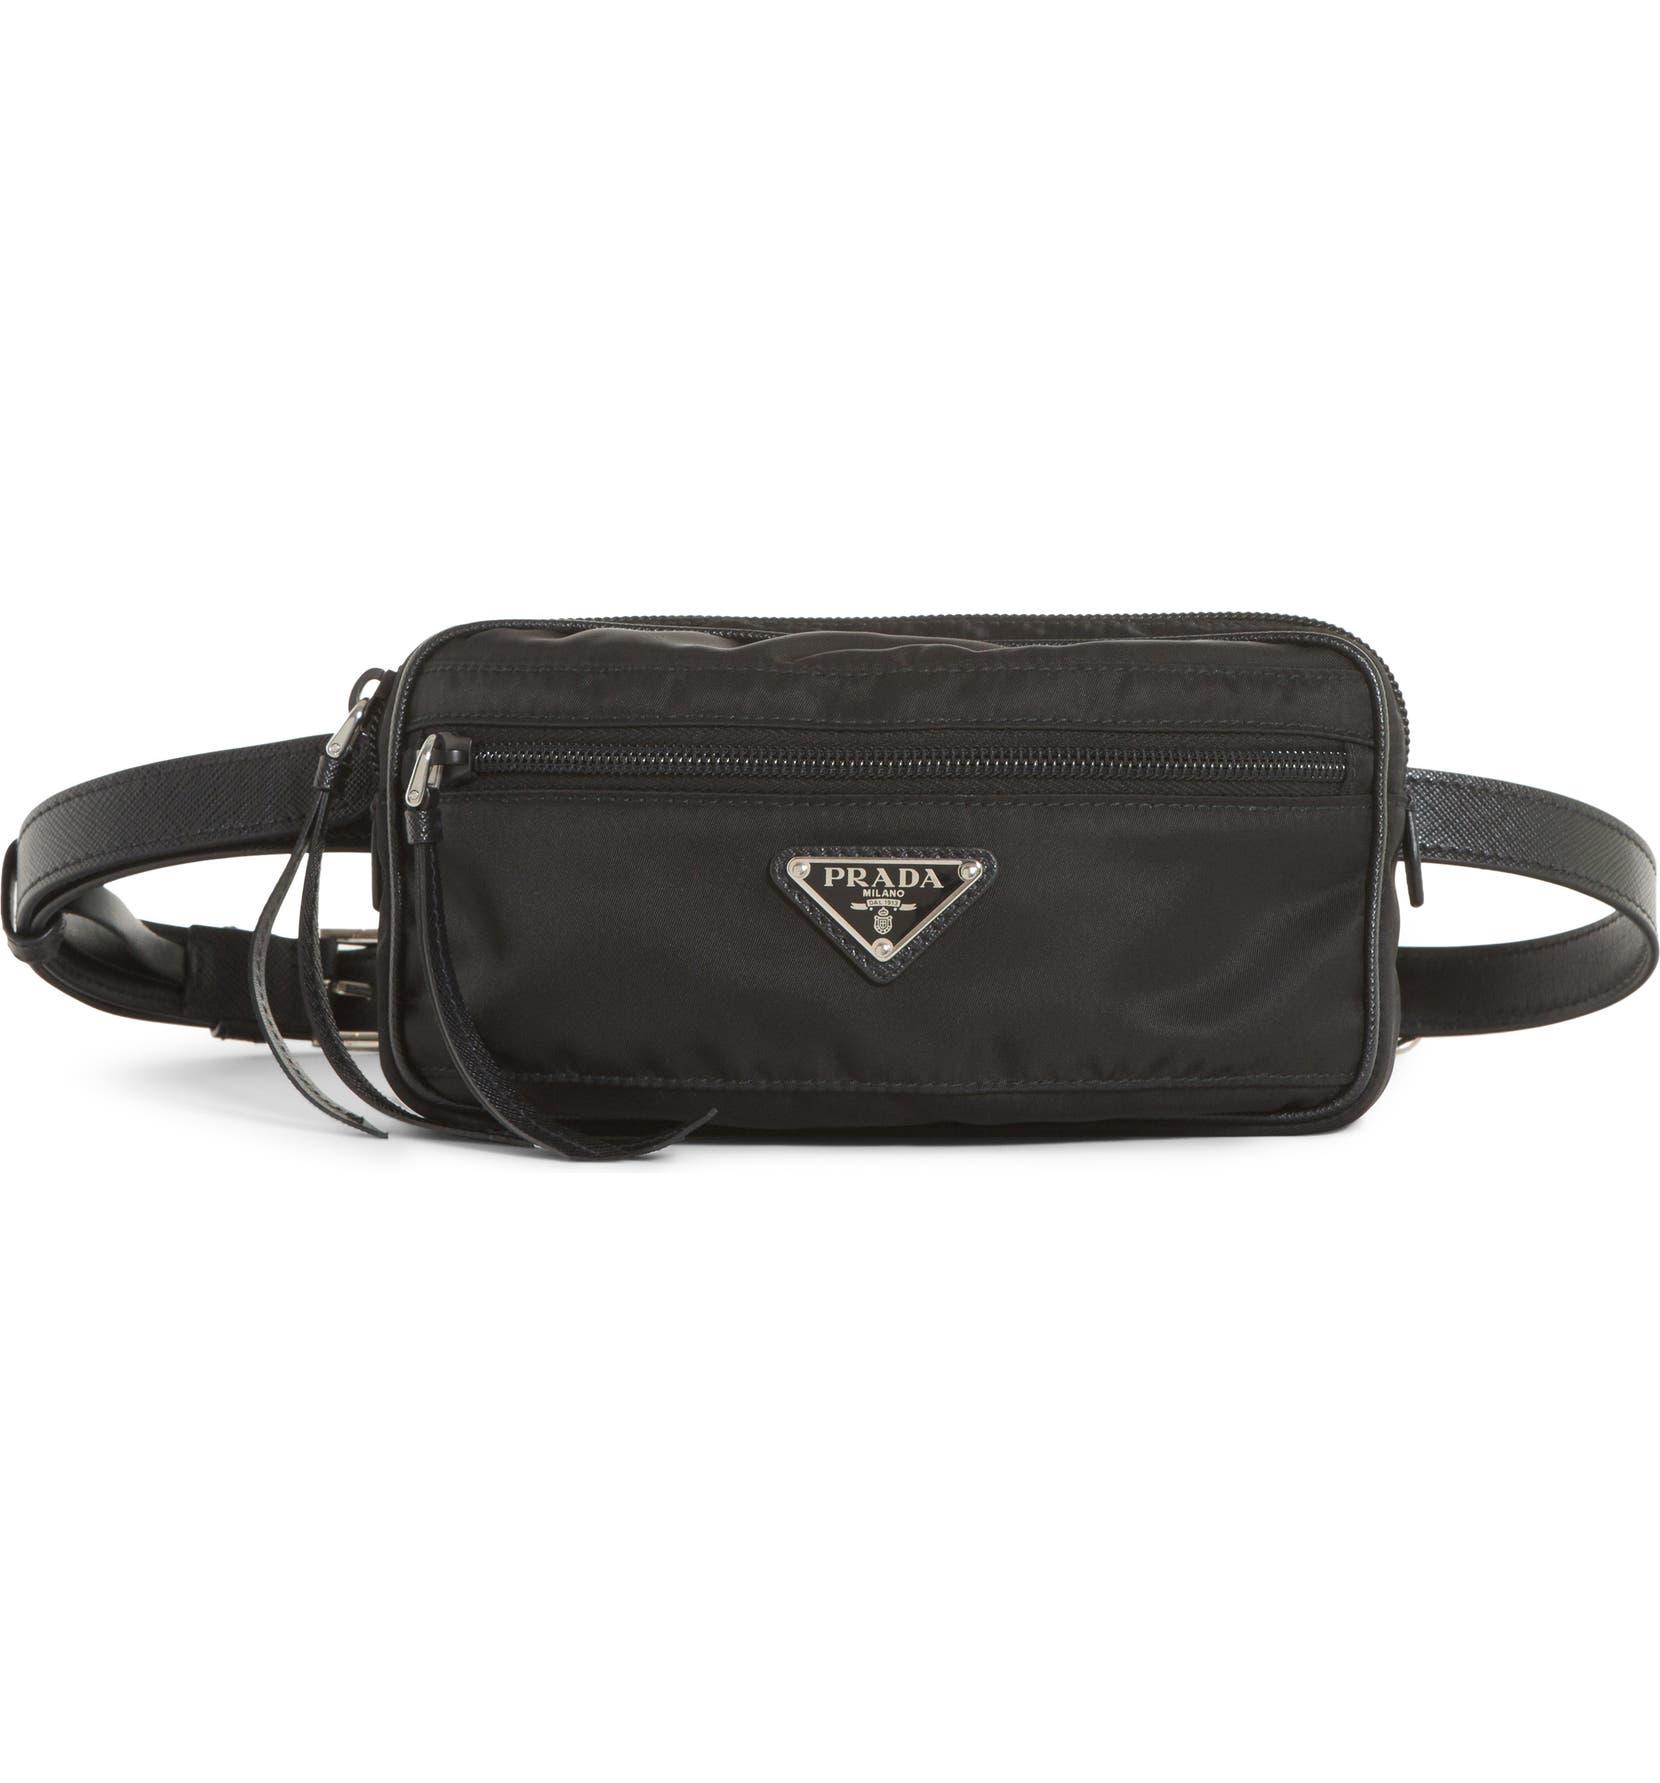 d06c0669aa0c Prada Small Nylon Belt Bag   Nordstrom